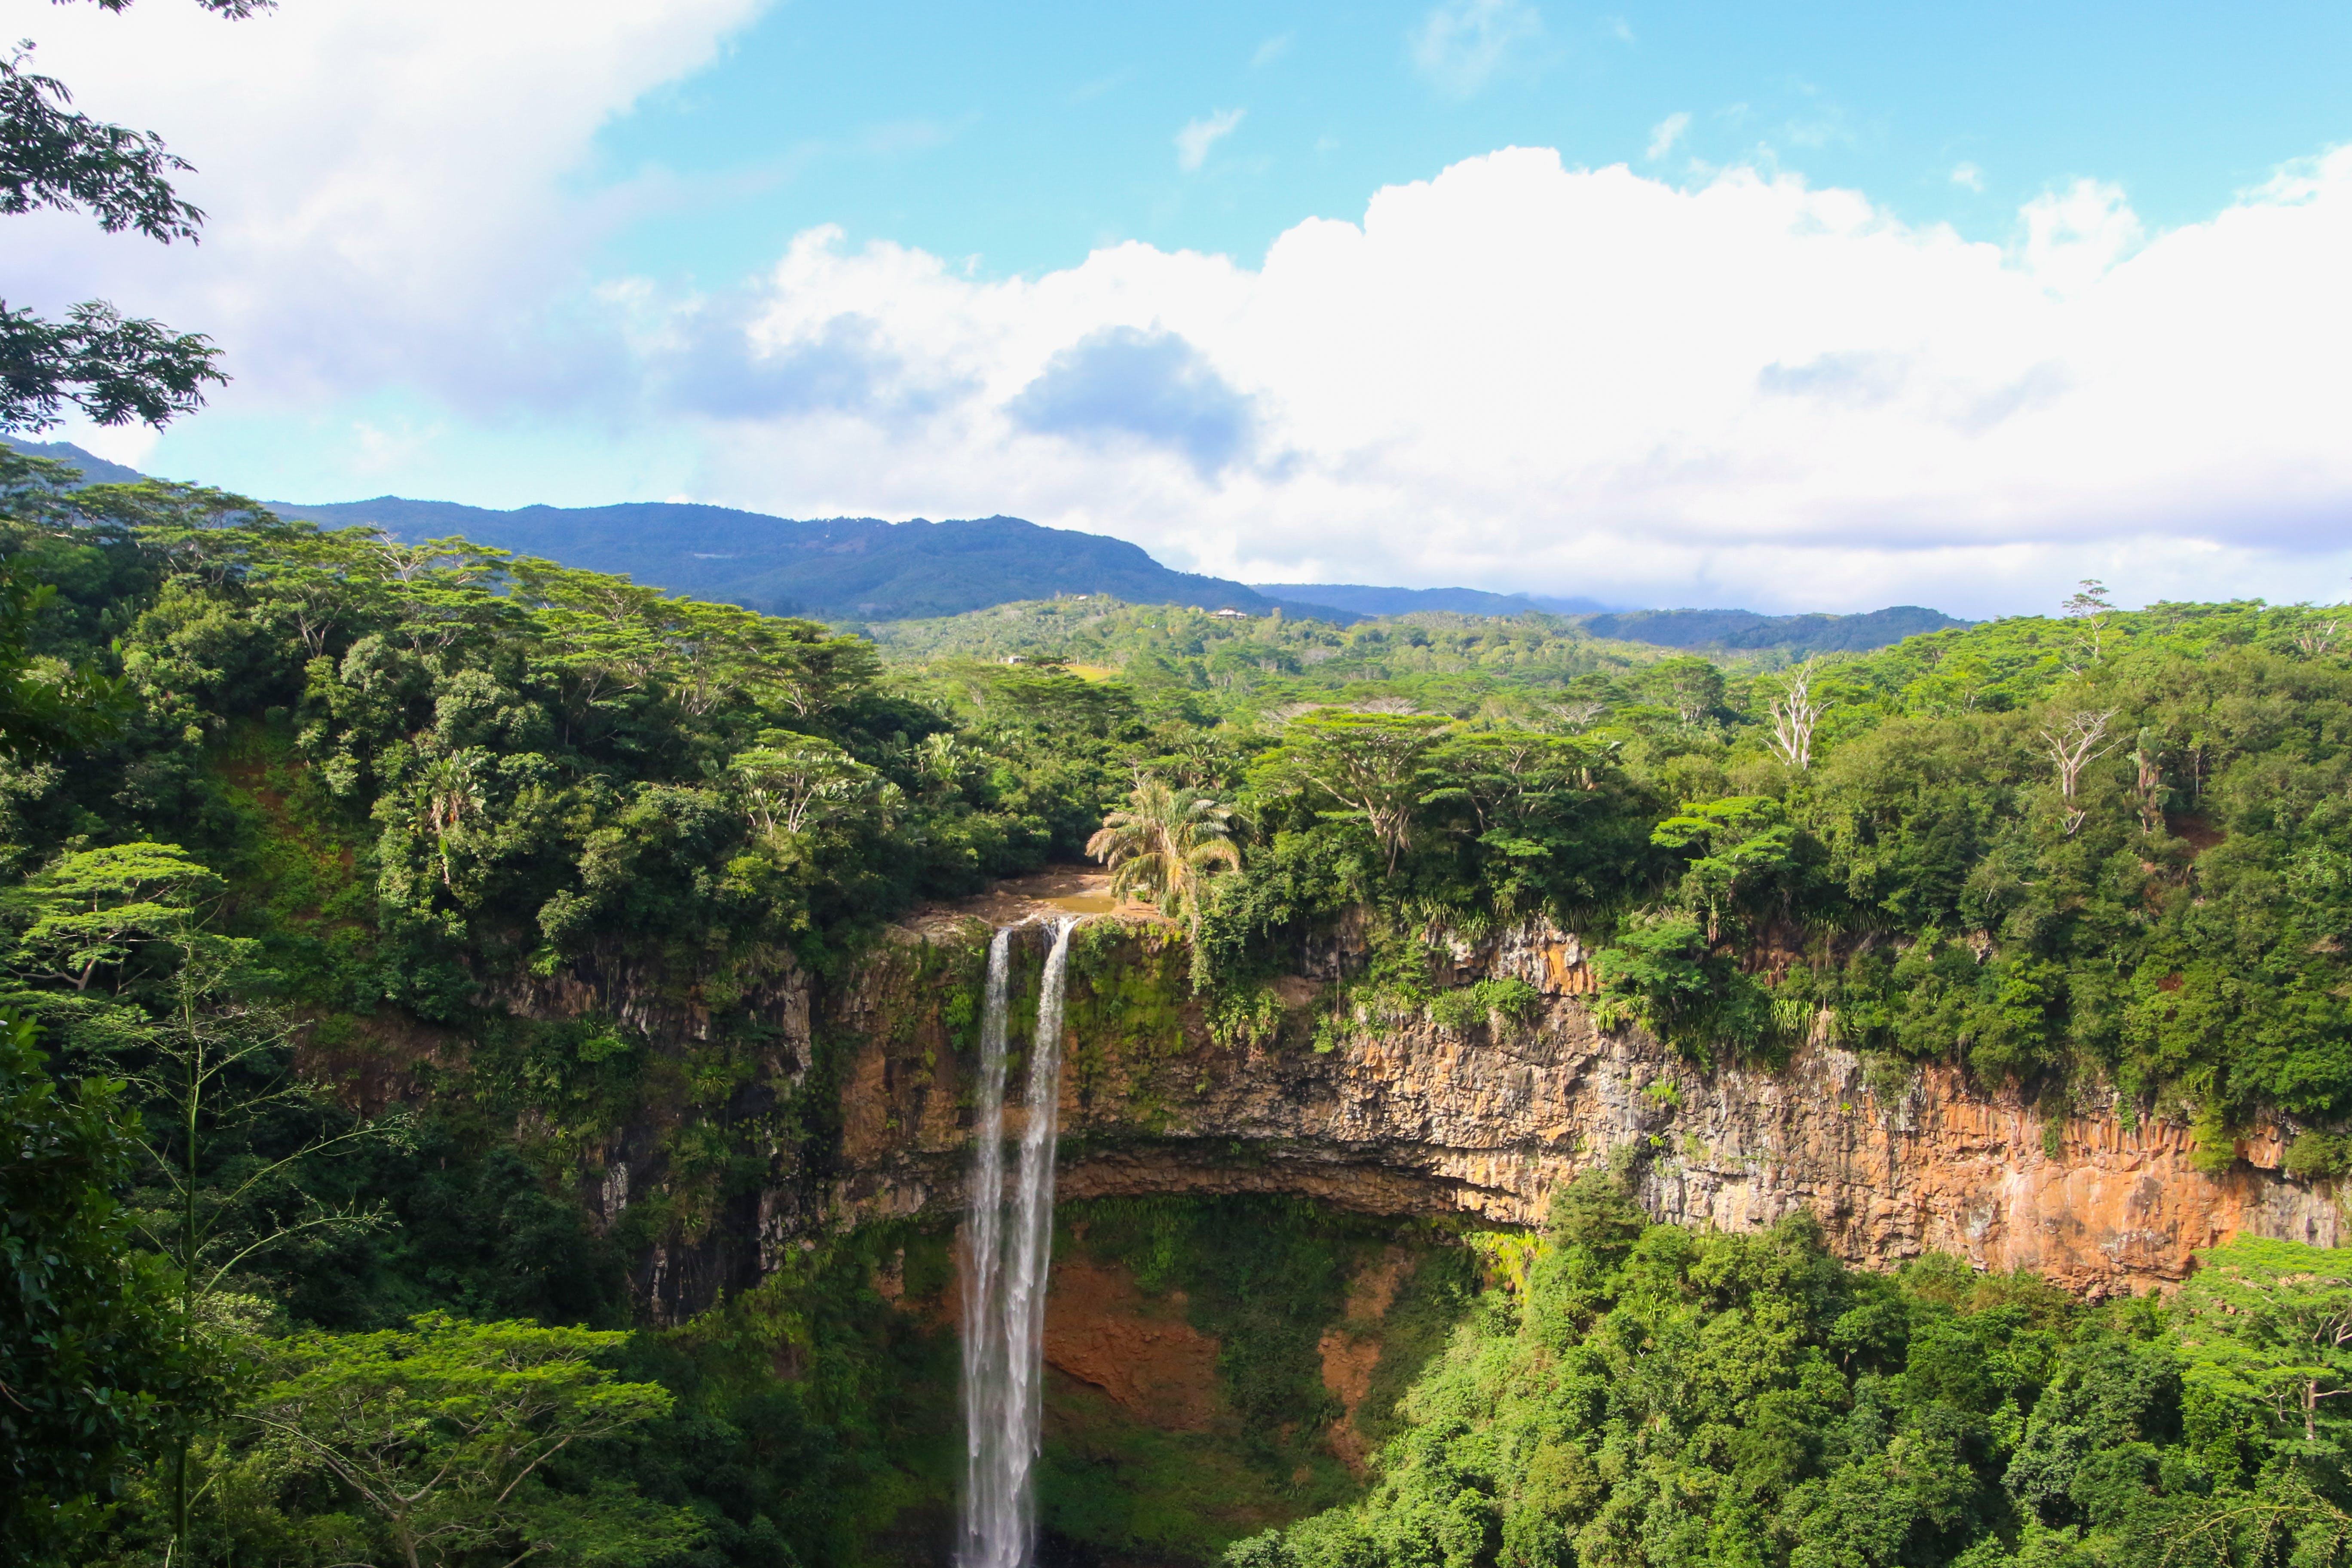 Top View of Water Falls